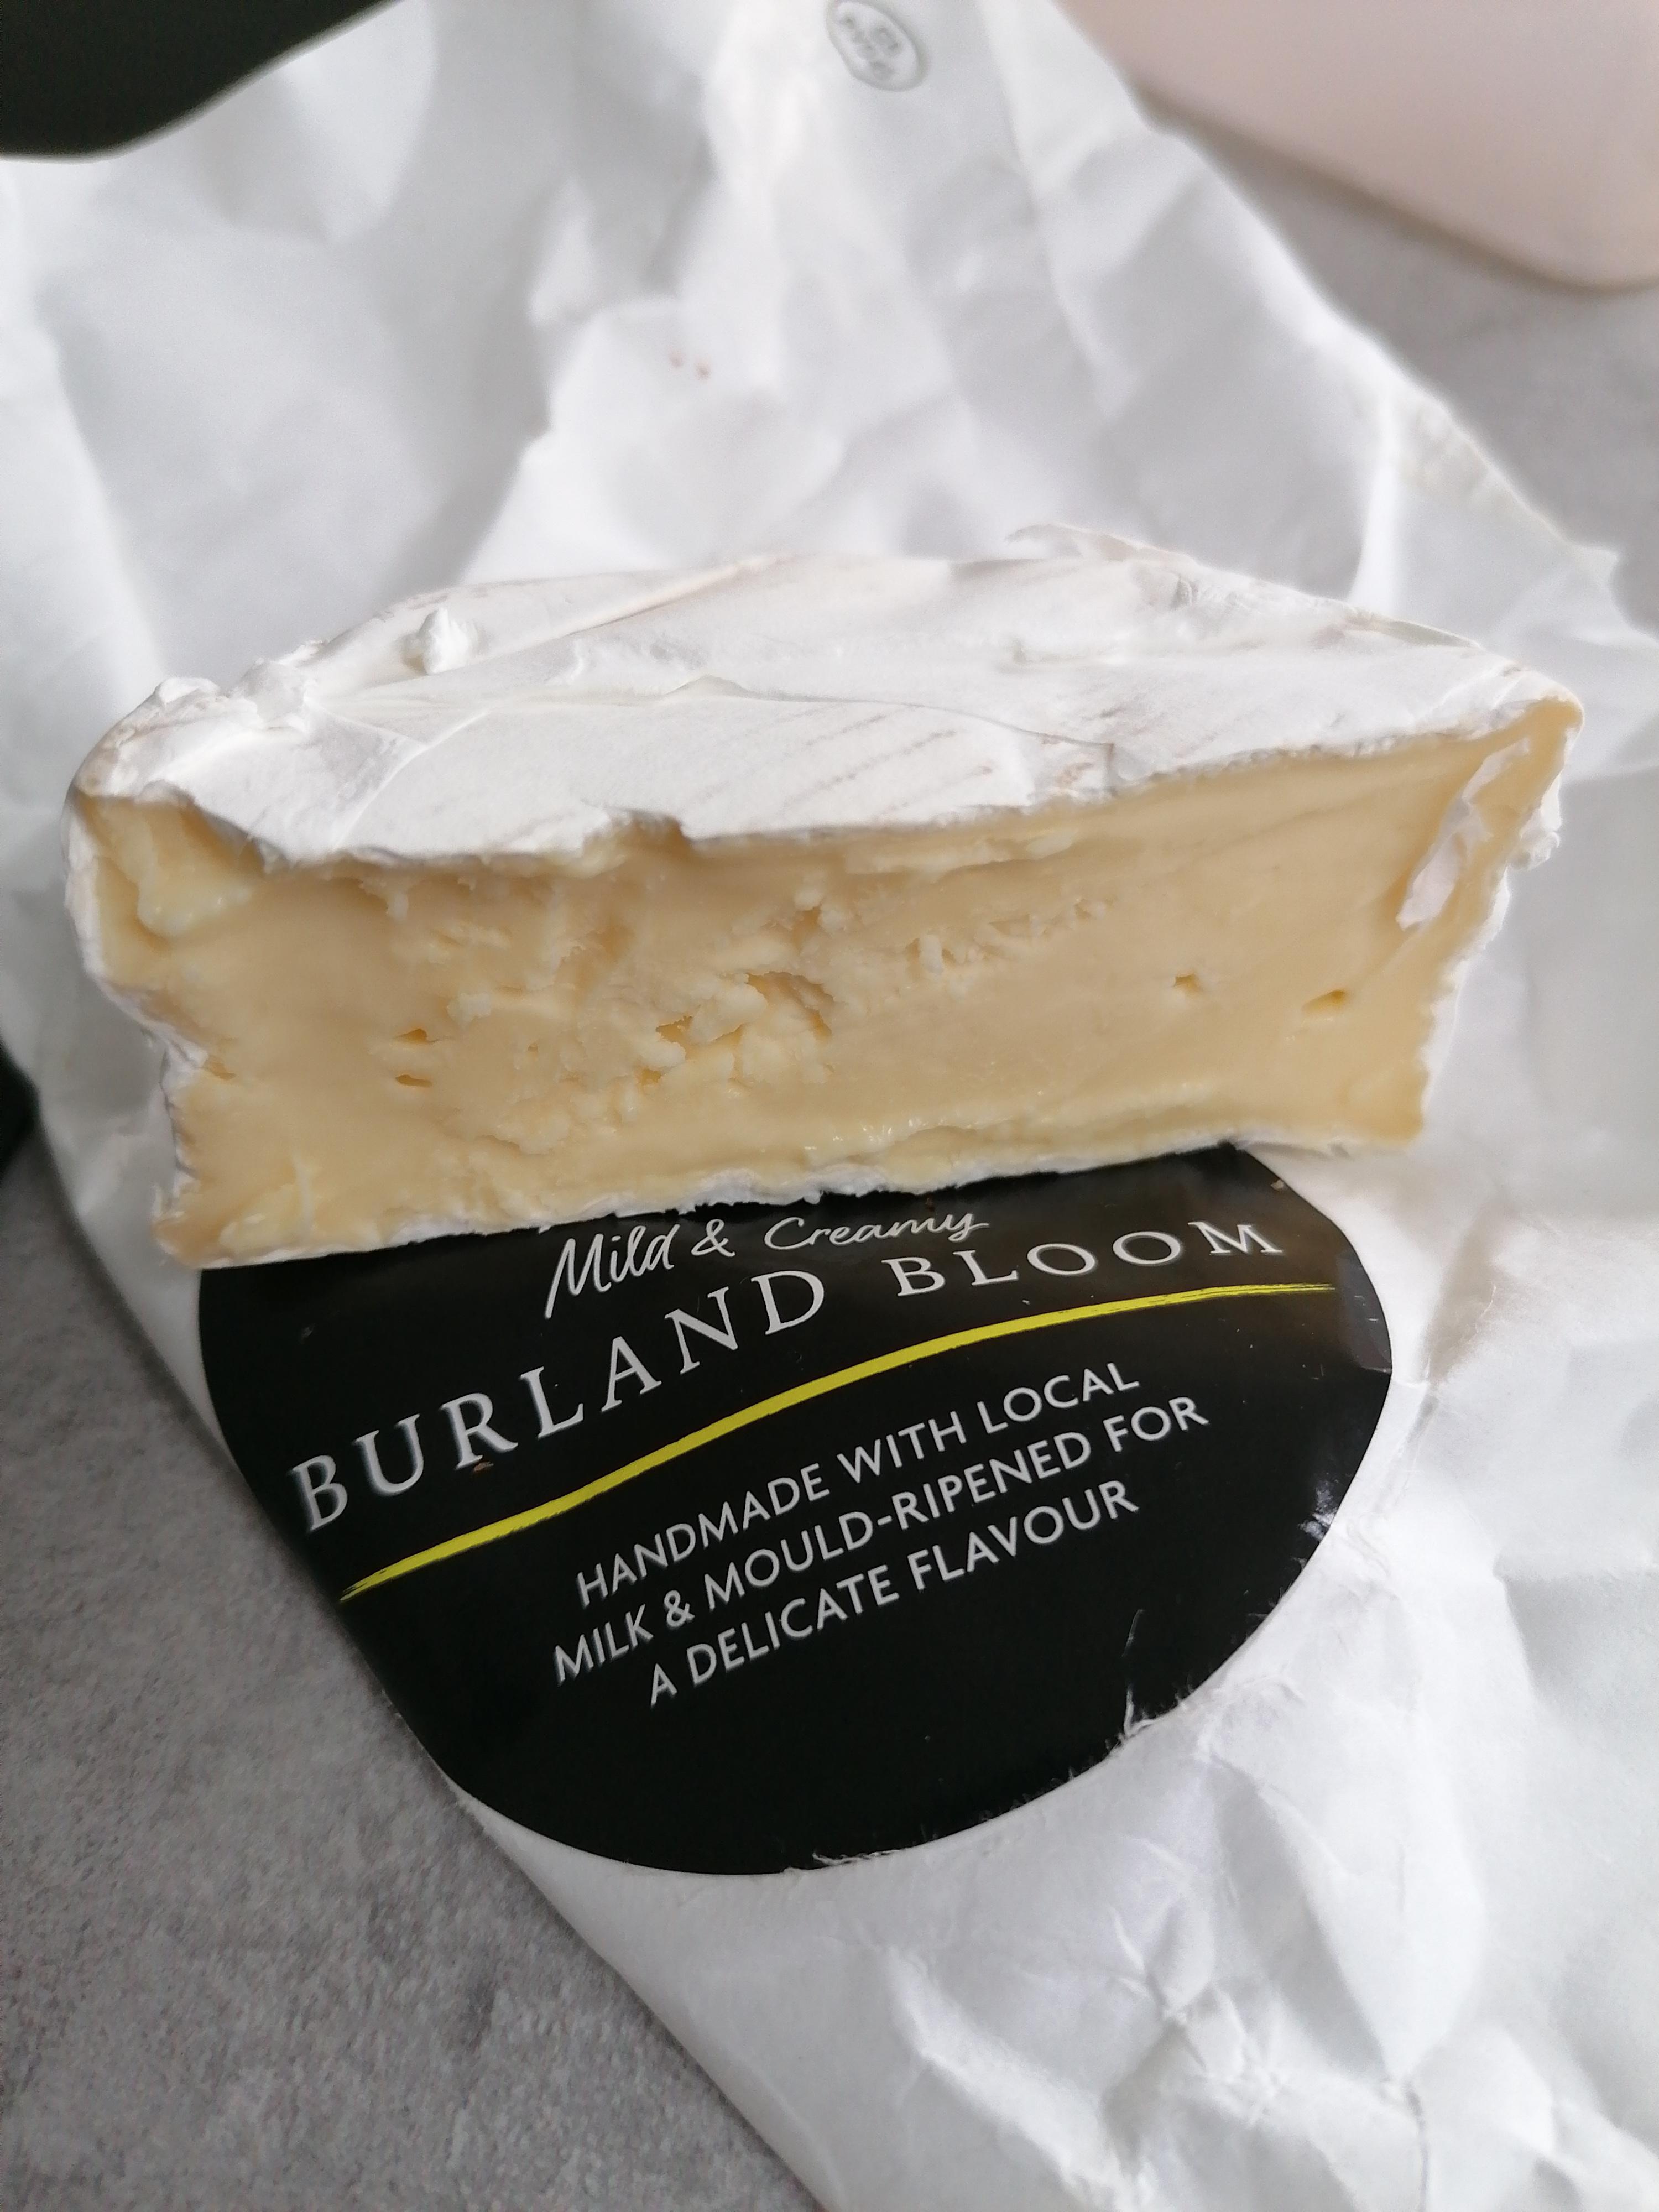 Burland Bloom